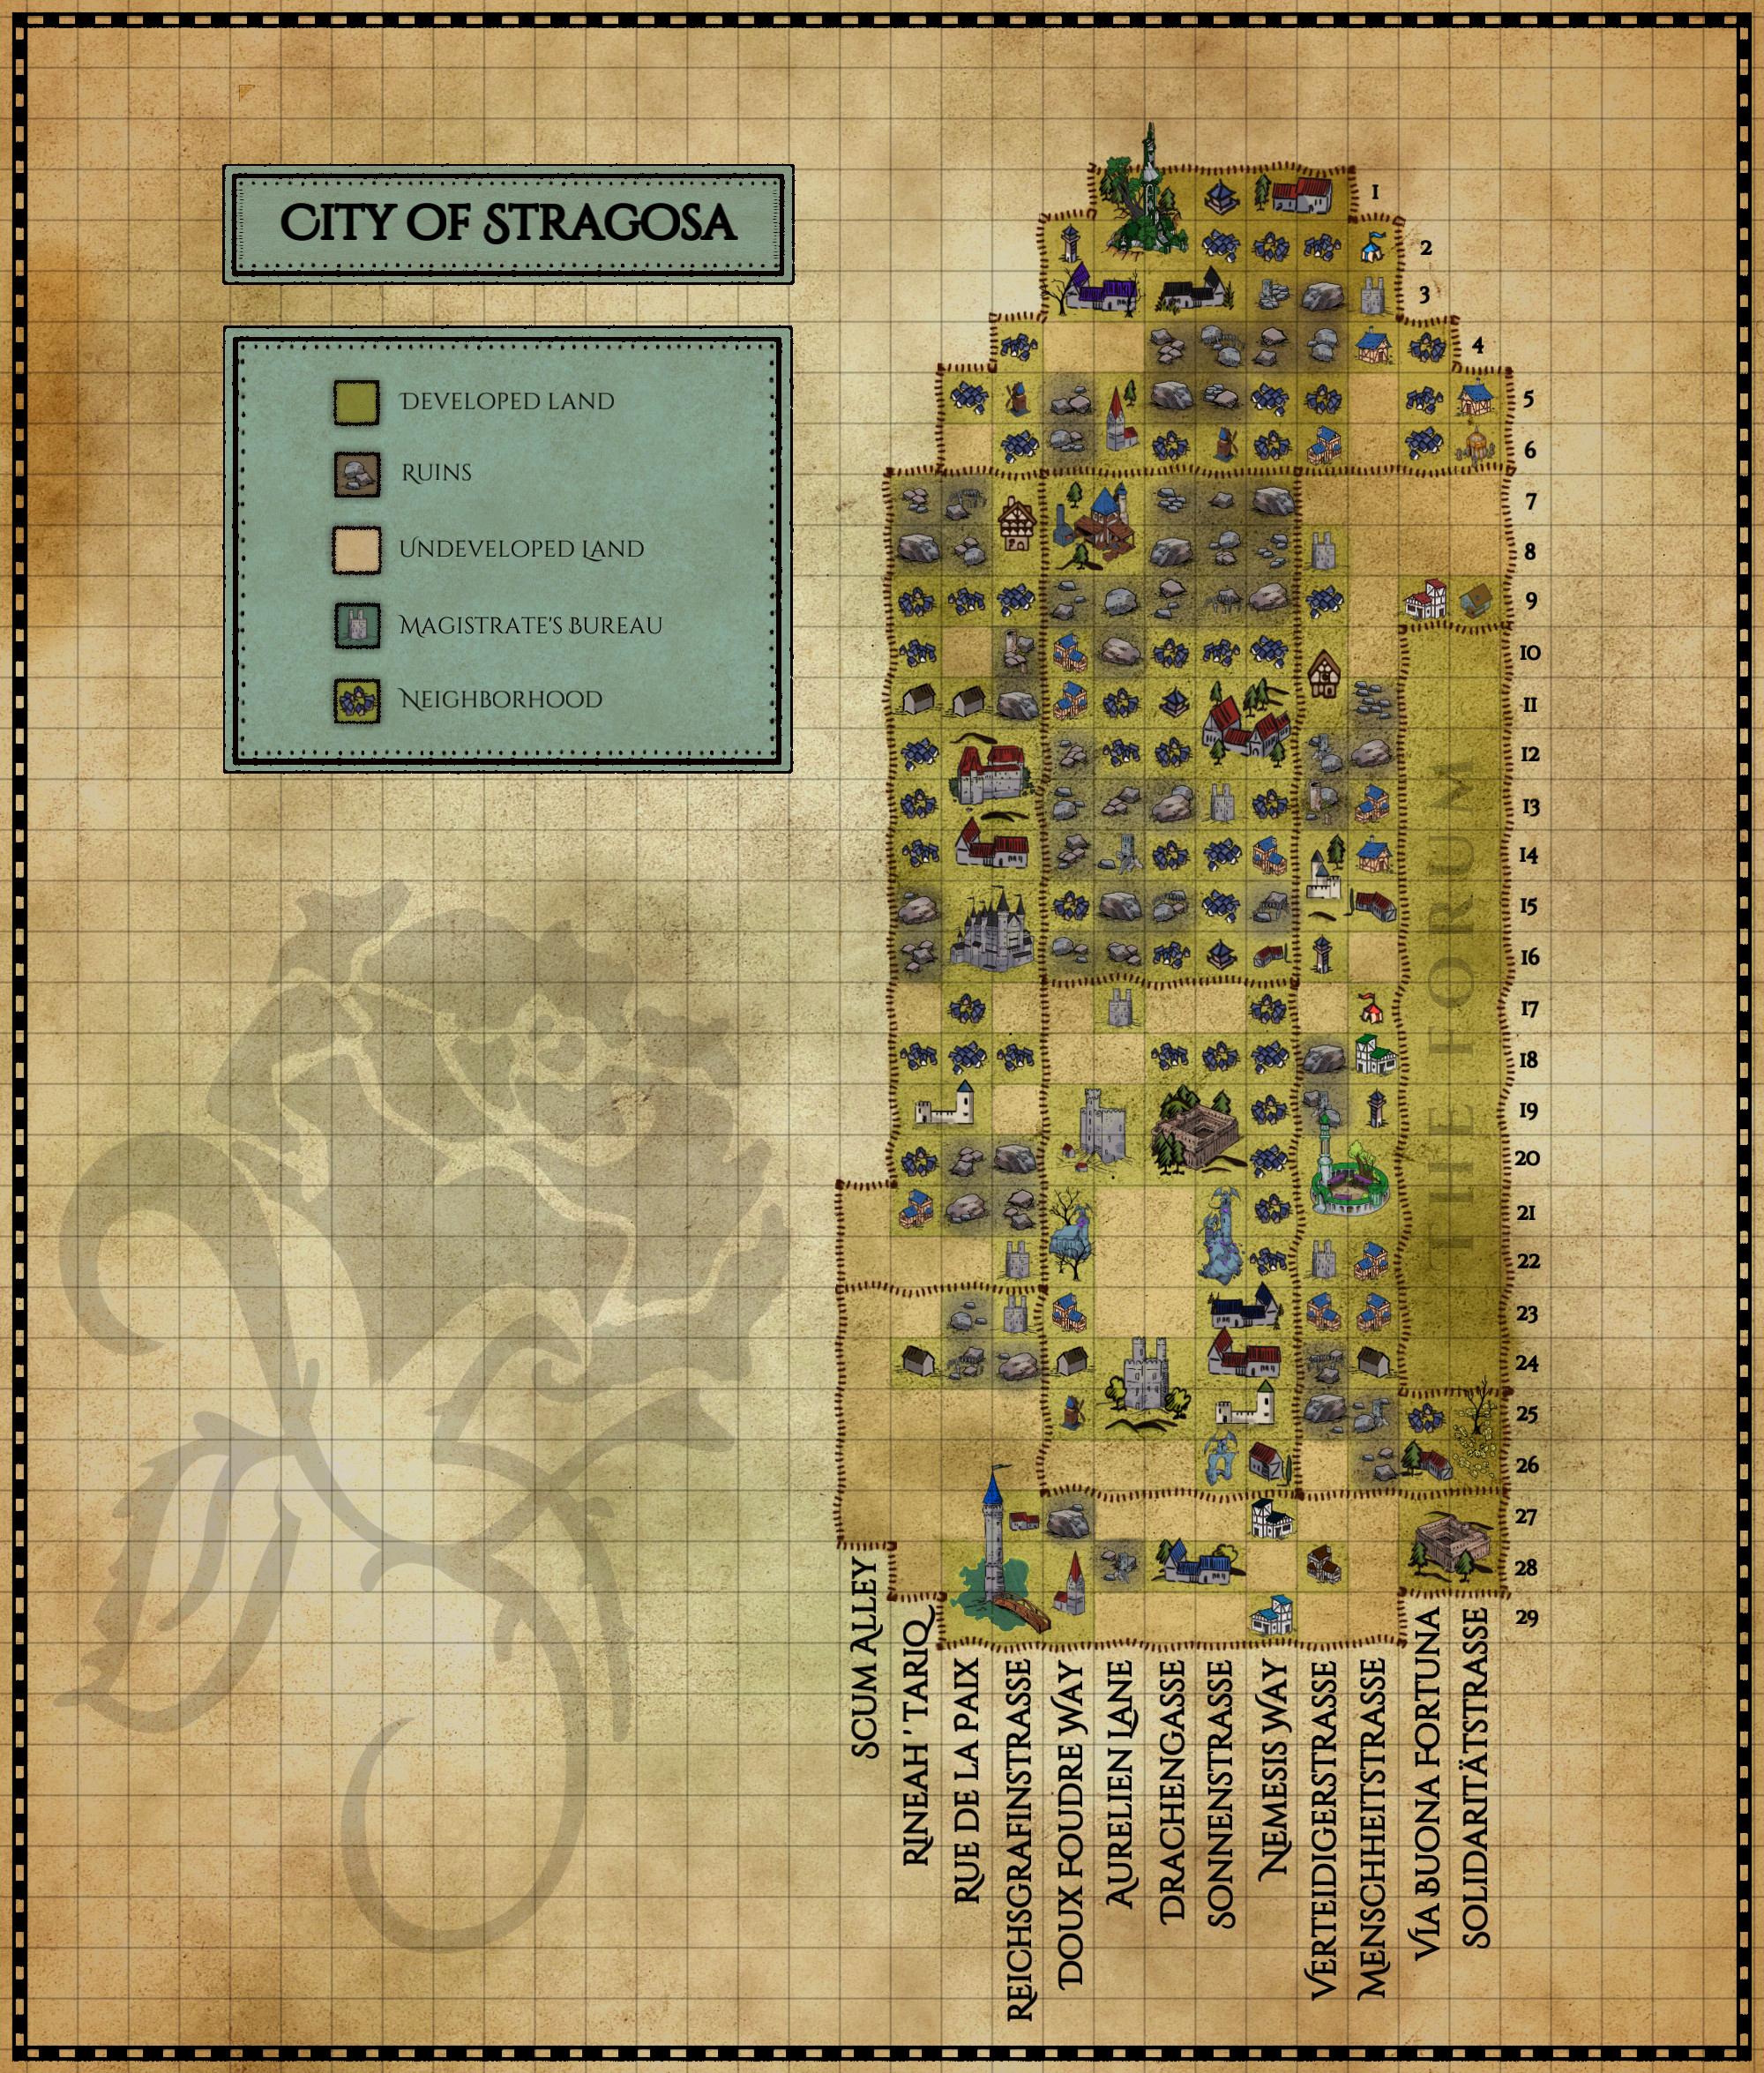 City of Stragosa